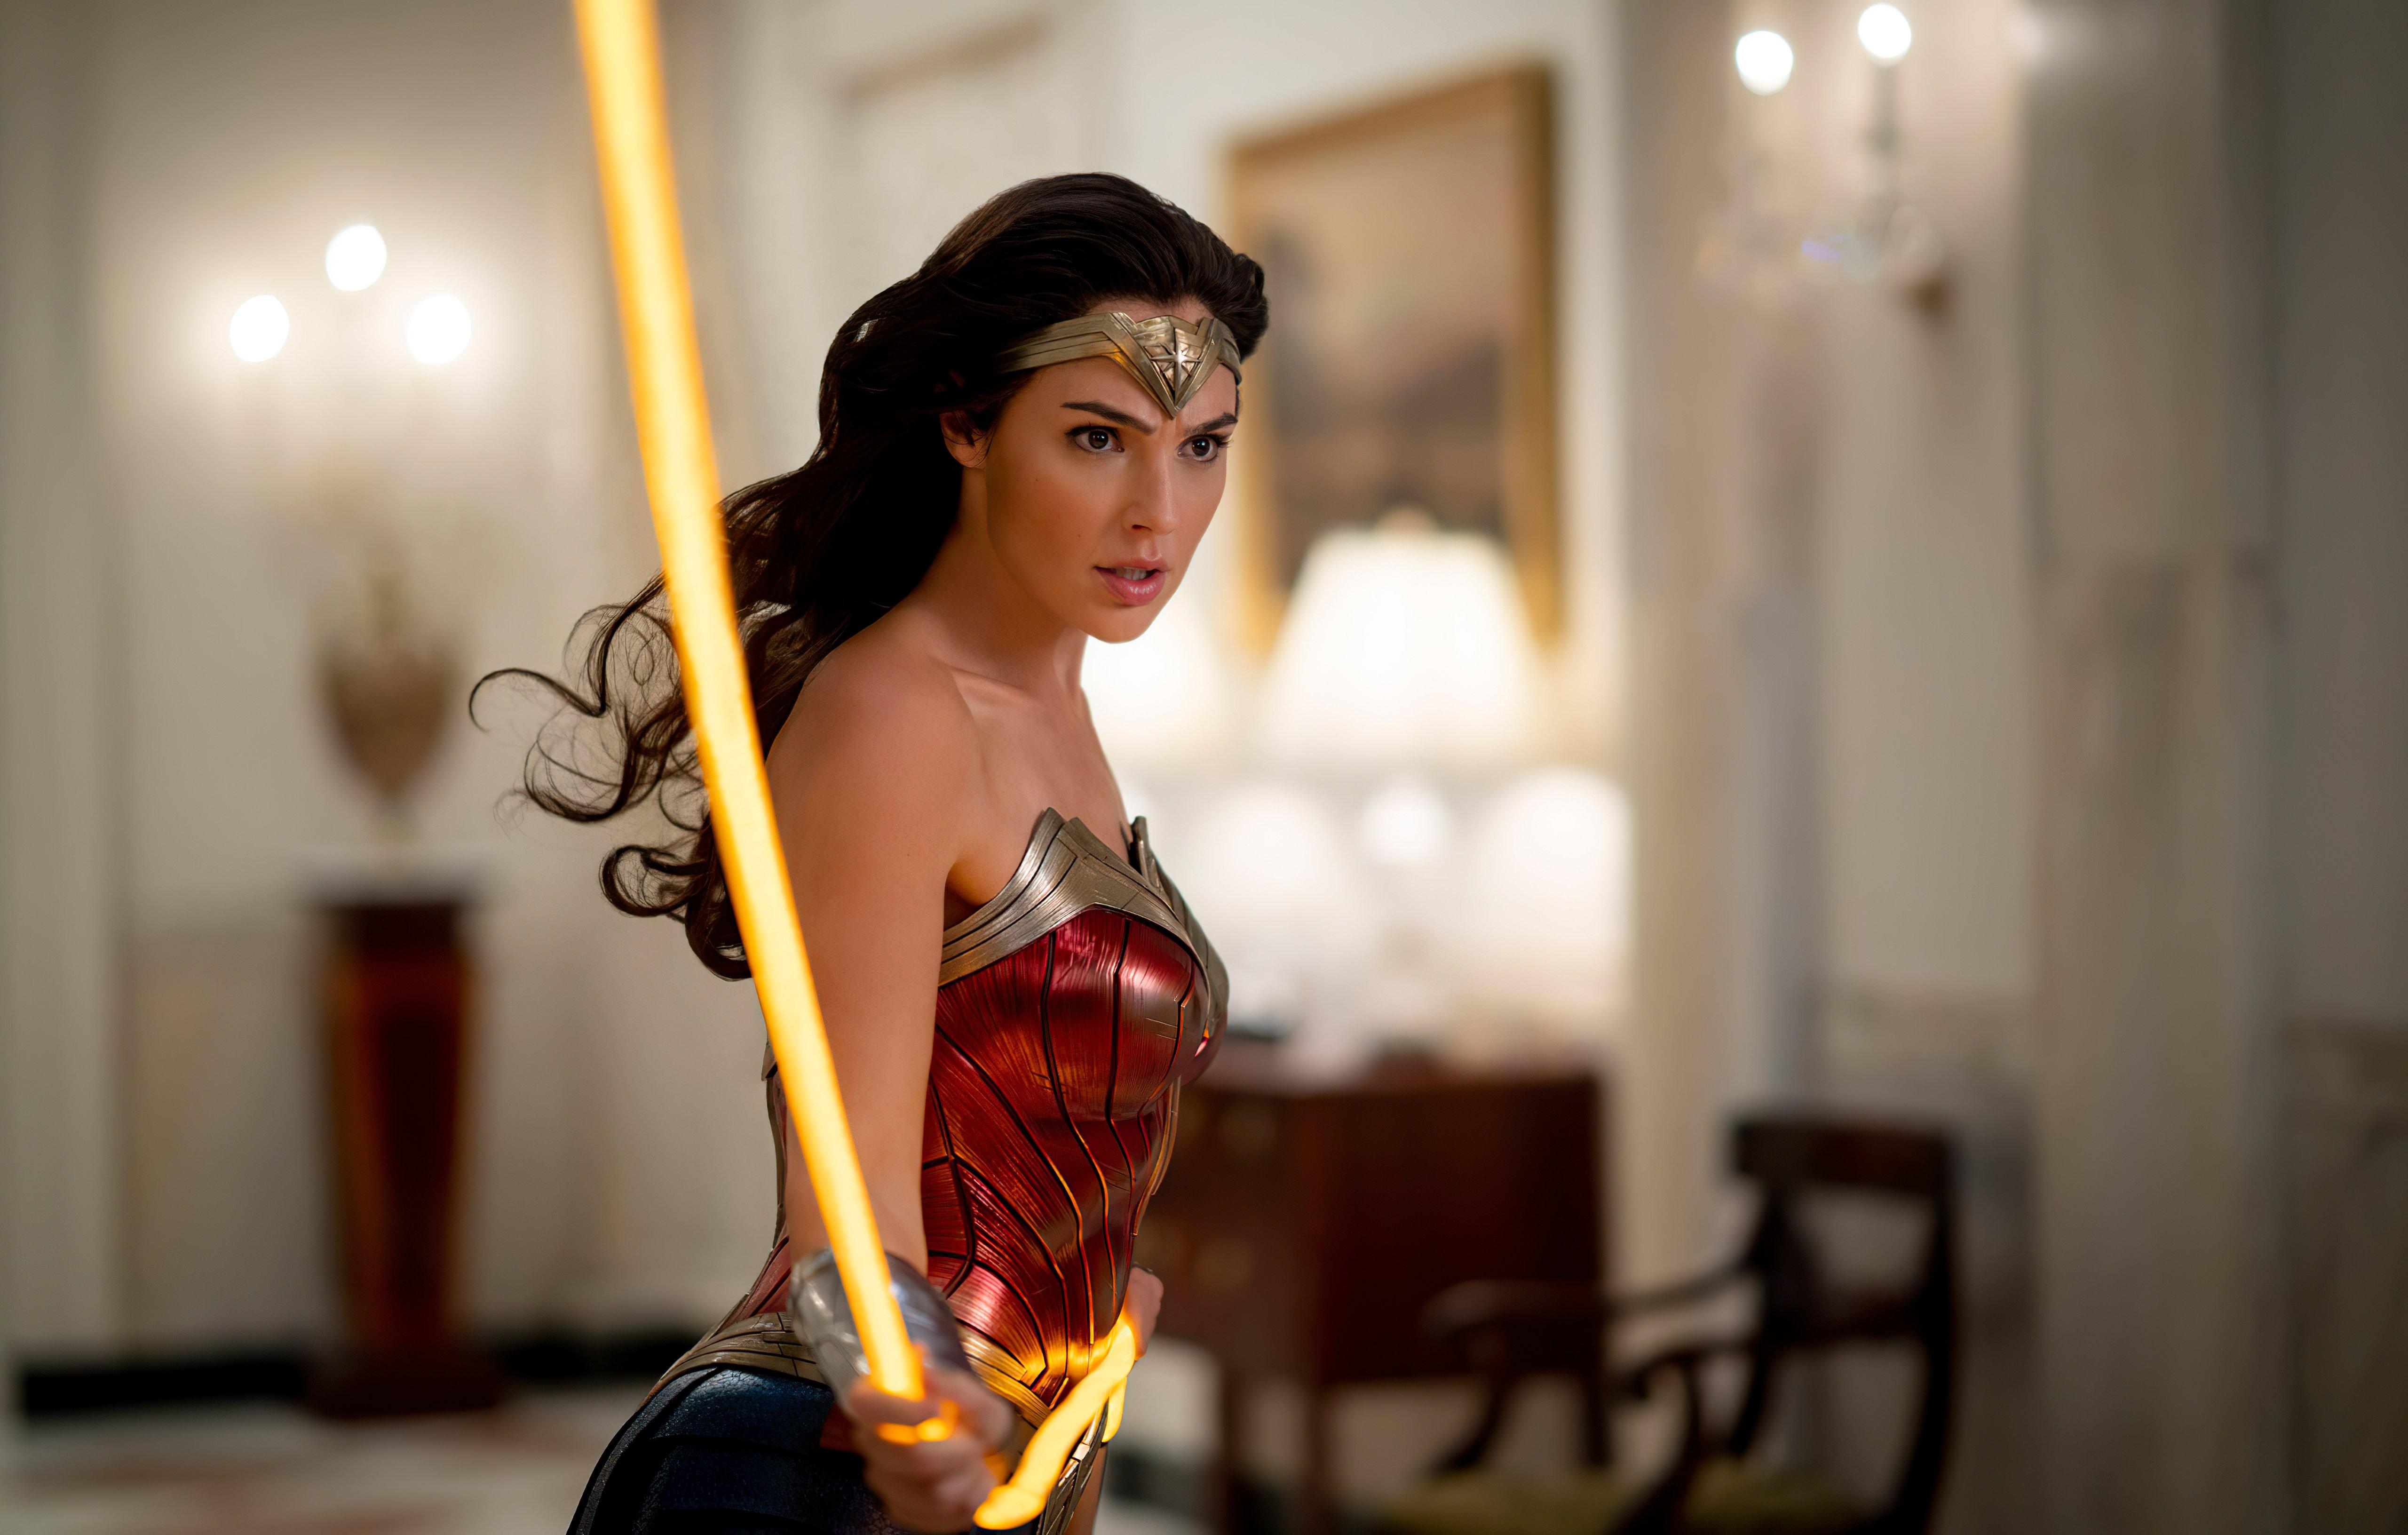 Wallpaper Gal Gadot in Wonder Woman 1964